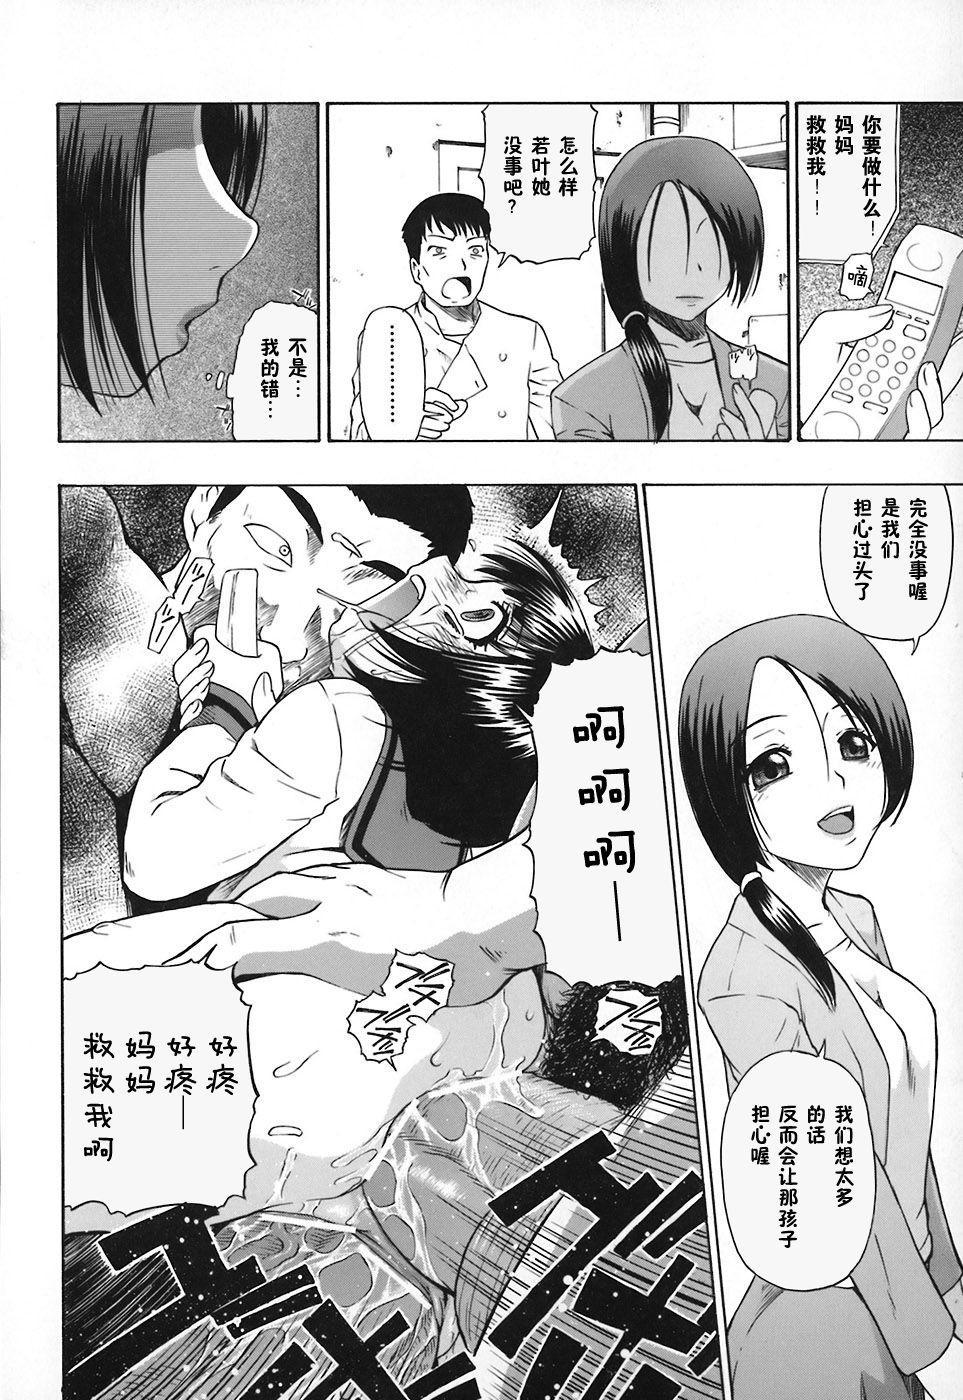 Akutoku no Sakae - Prosperites du Vice 25